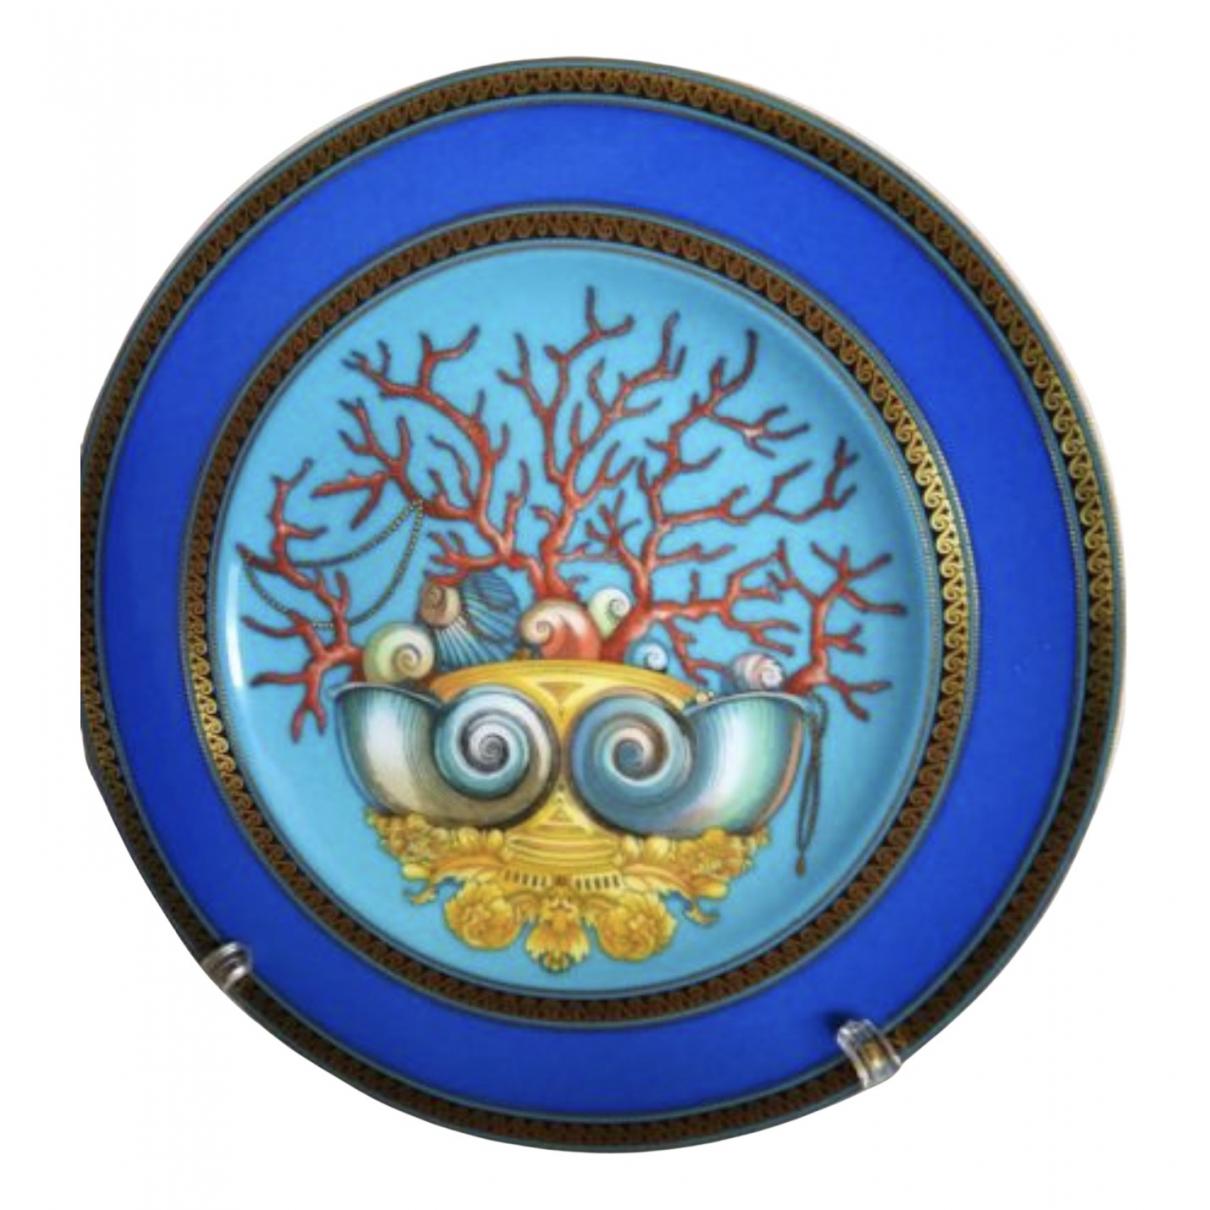 Bandeja de Porcelana Versace